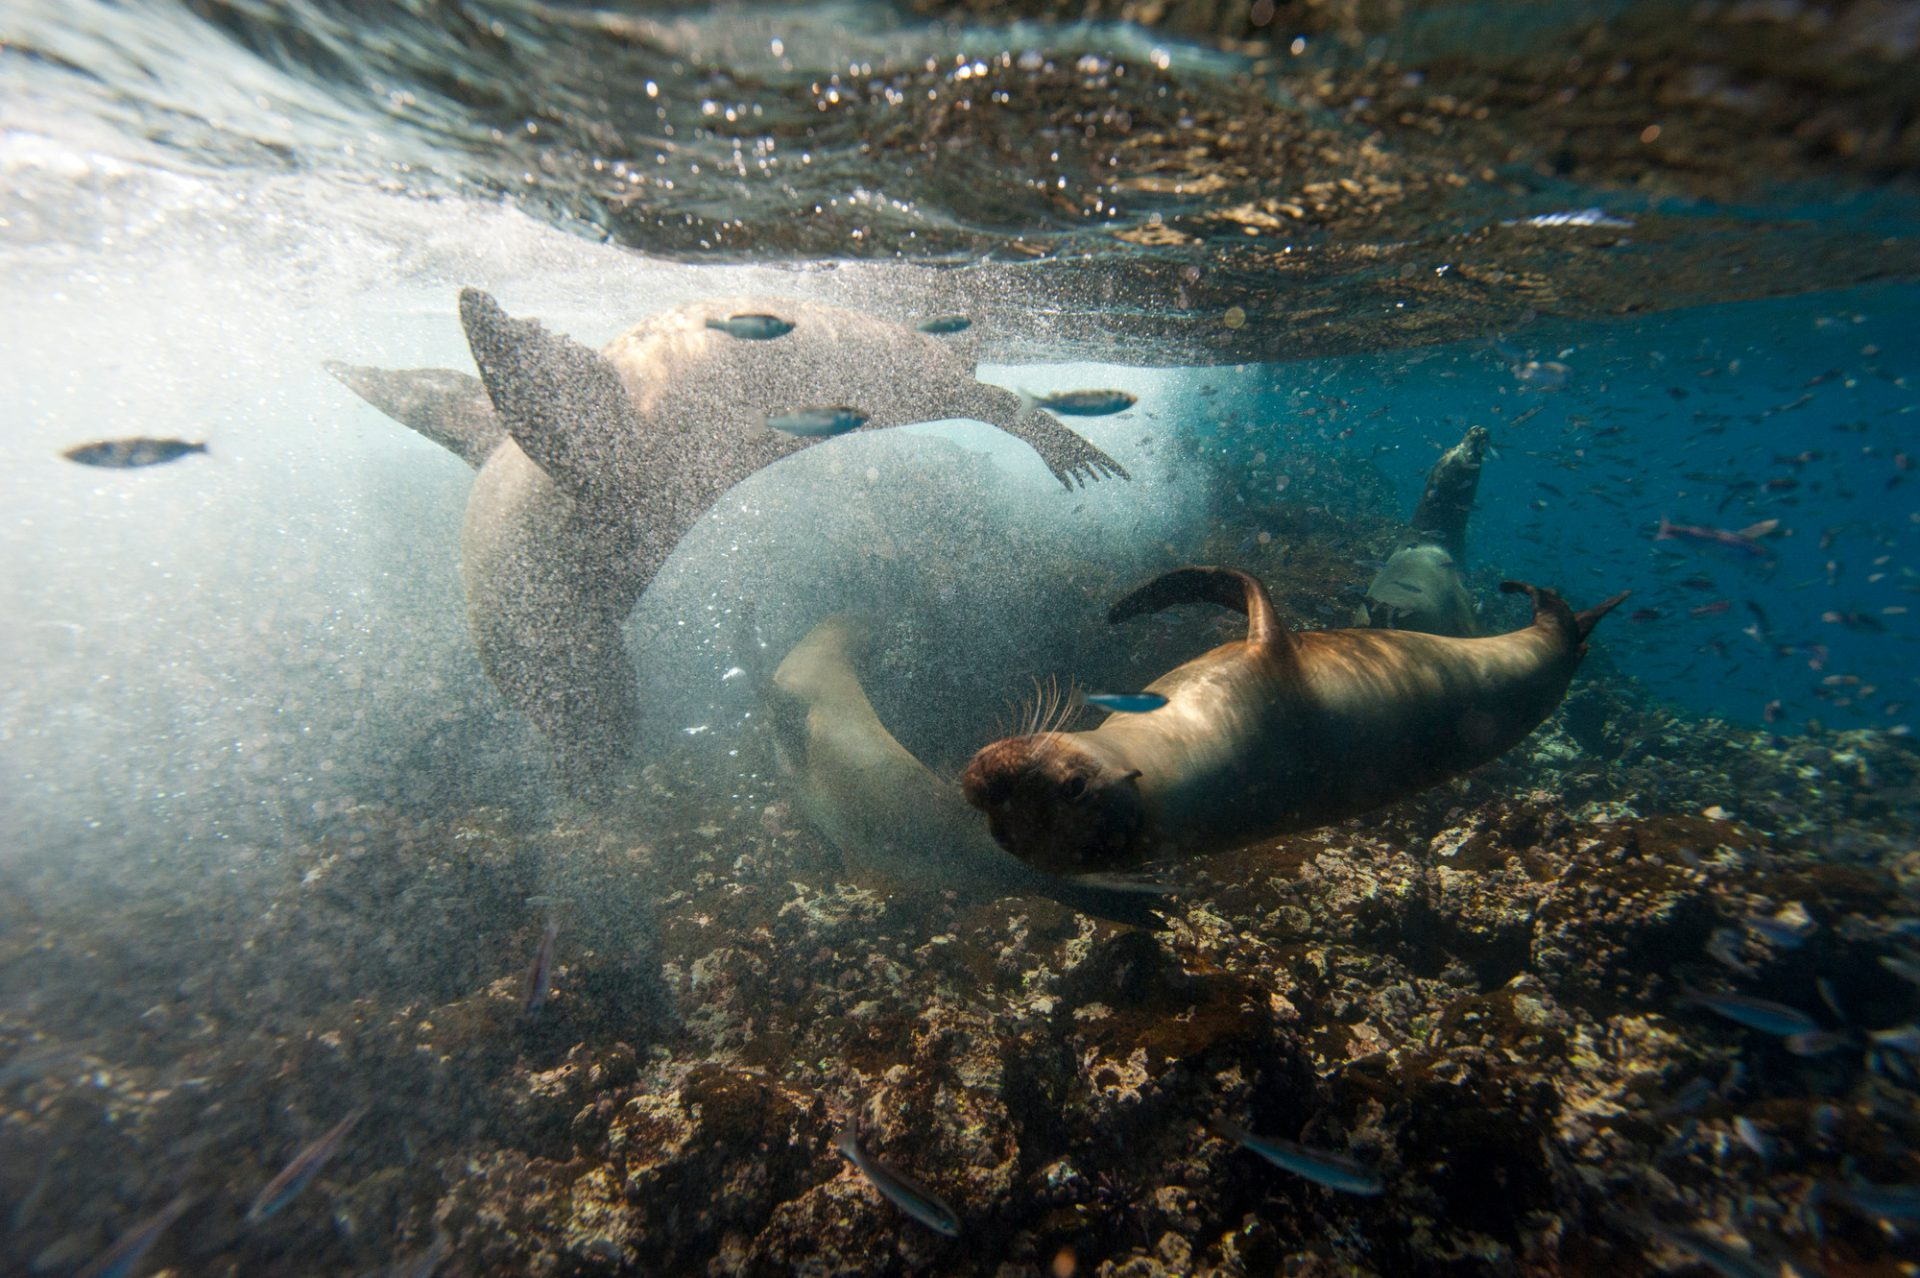 Photo: Galapagos sea lions (Zalophus wollebaeki) swim along Floreana Island in Galapagos National Park.